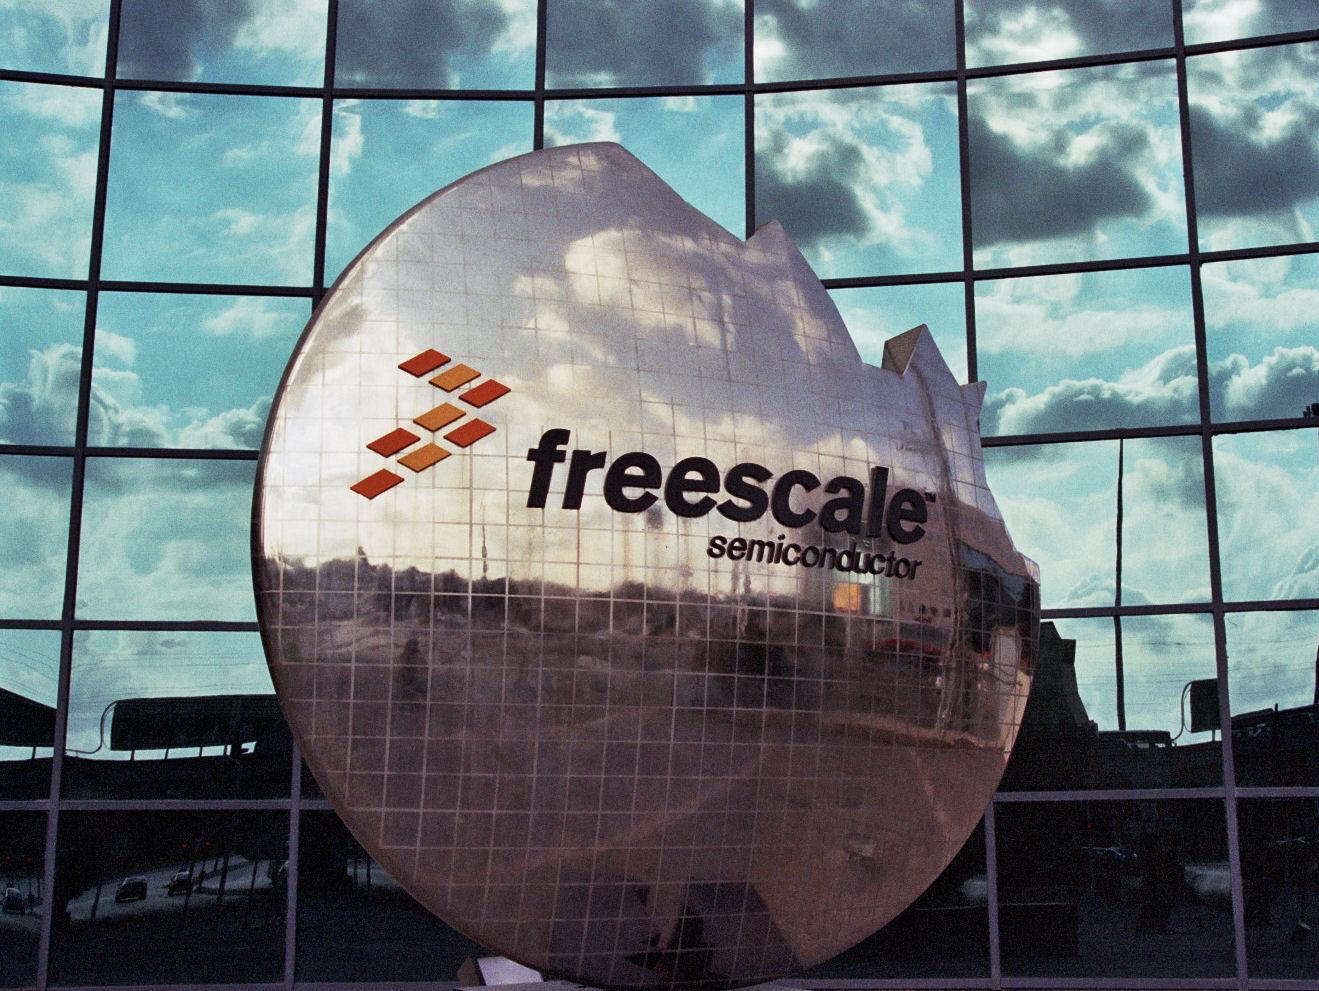 Freescale Semiconductor - Wikipedia